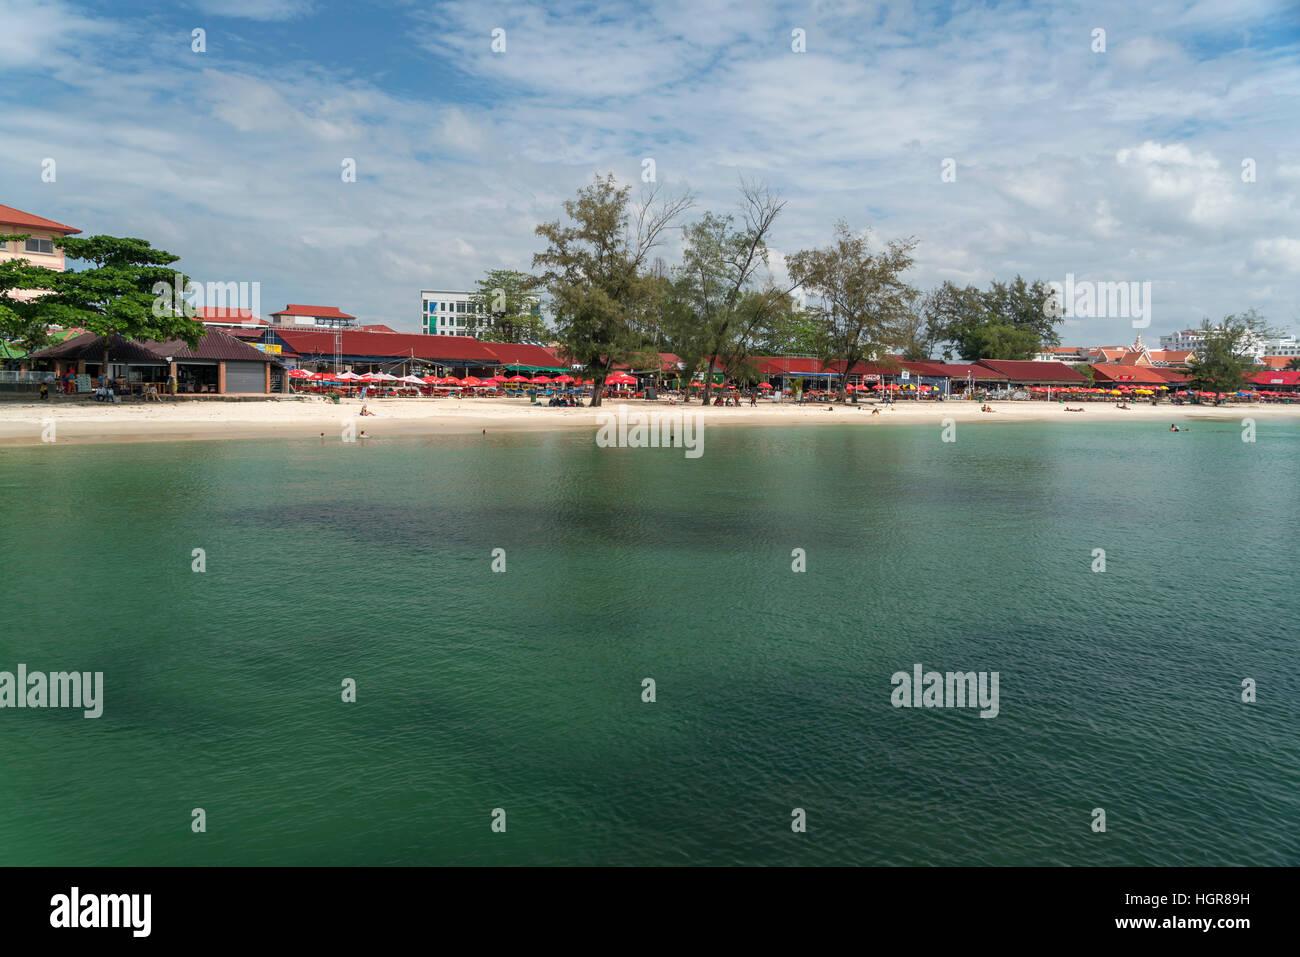 Serendipity Beach in Sihanoukville, Cambodia, Asia - Stock Image